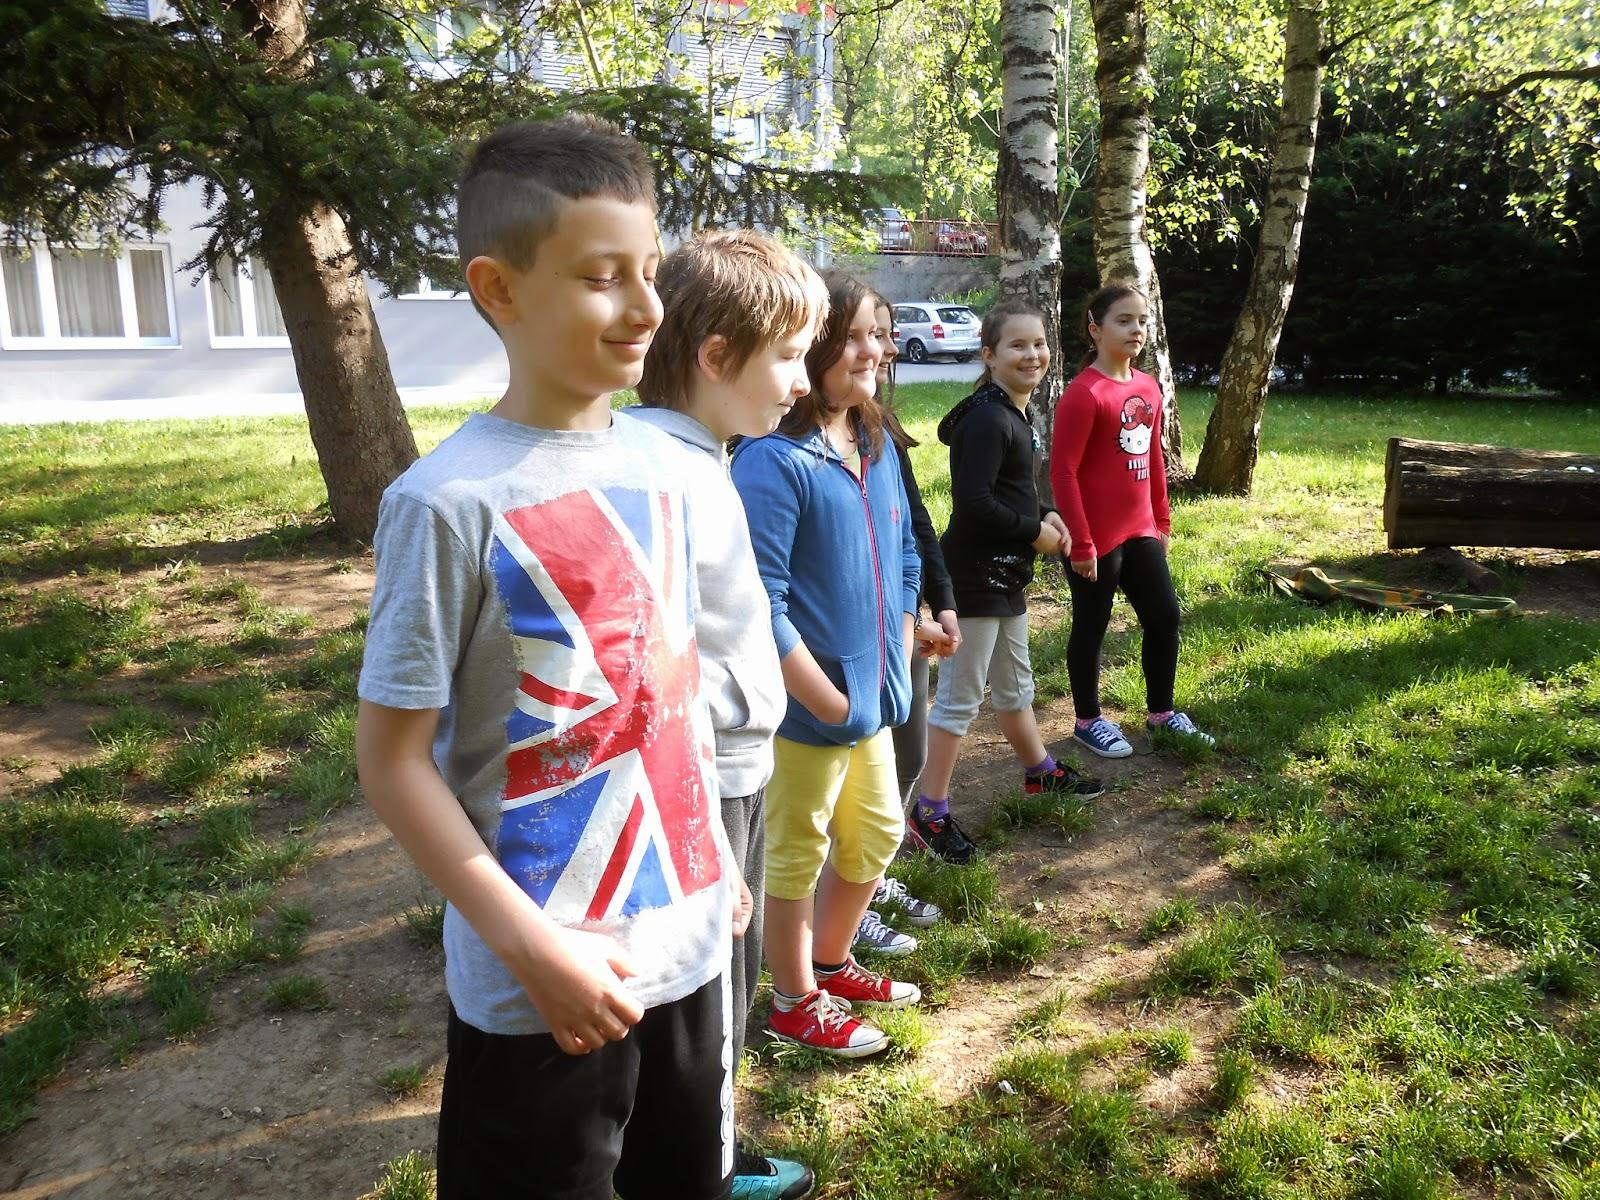 Športni dan 4. a in 4. b, Ilirska Bistrica, 19. 5. 2015 - DSCN4630.JPG